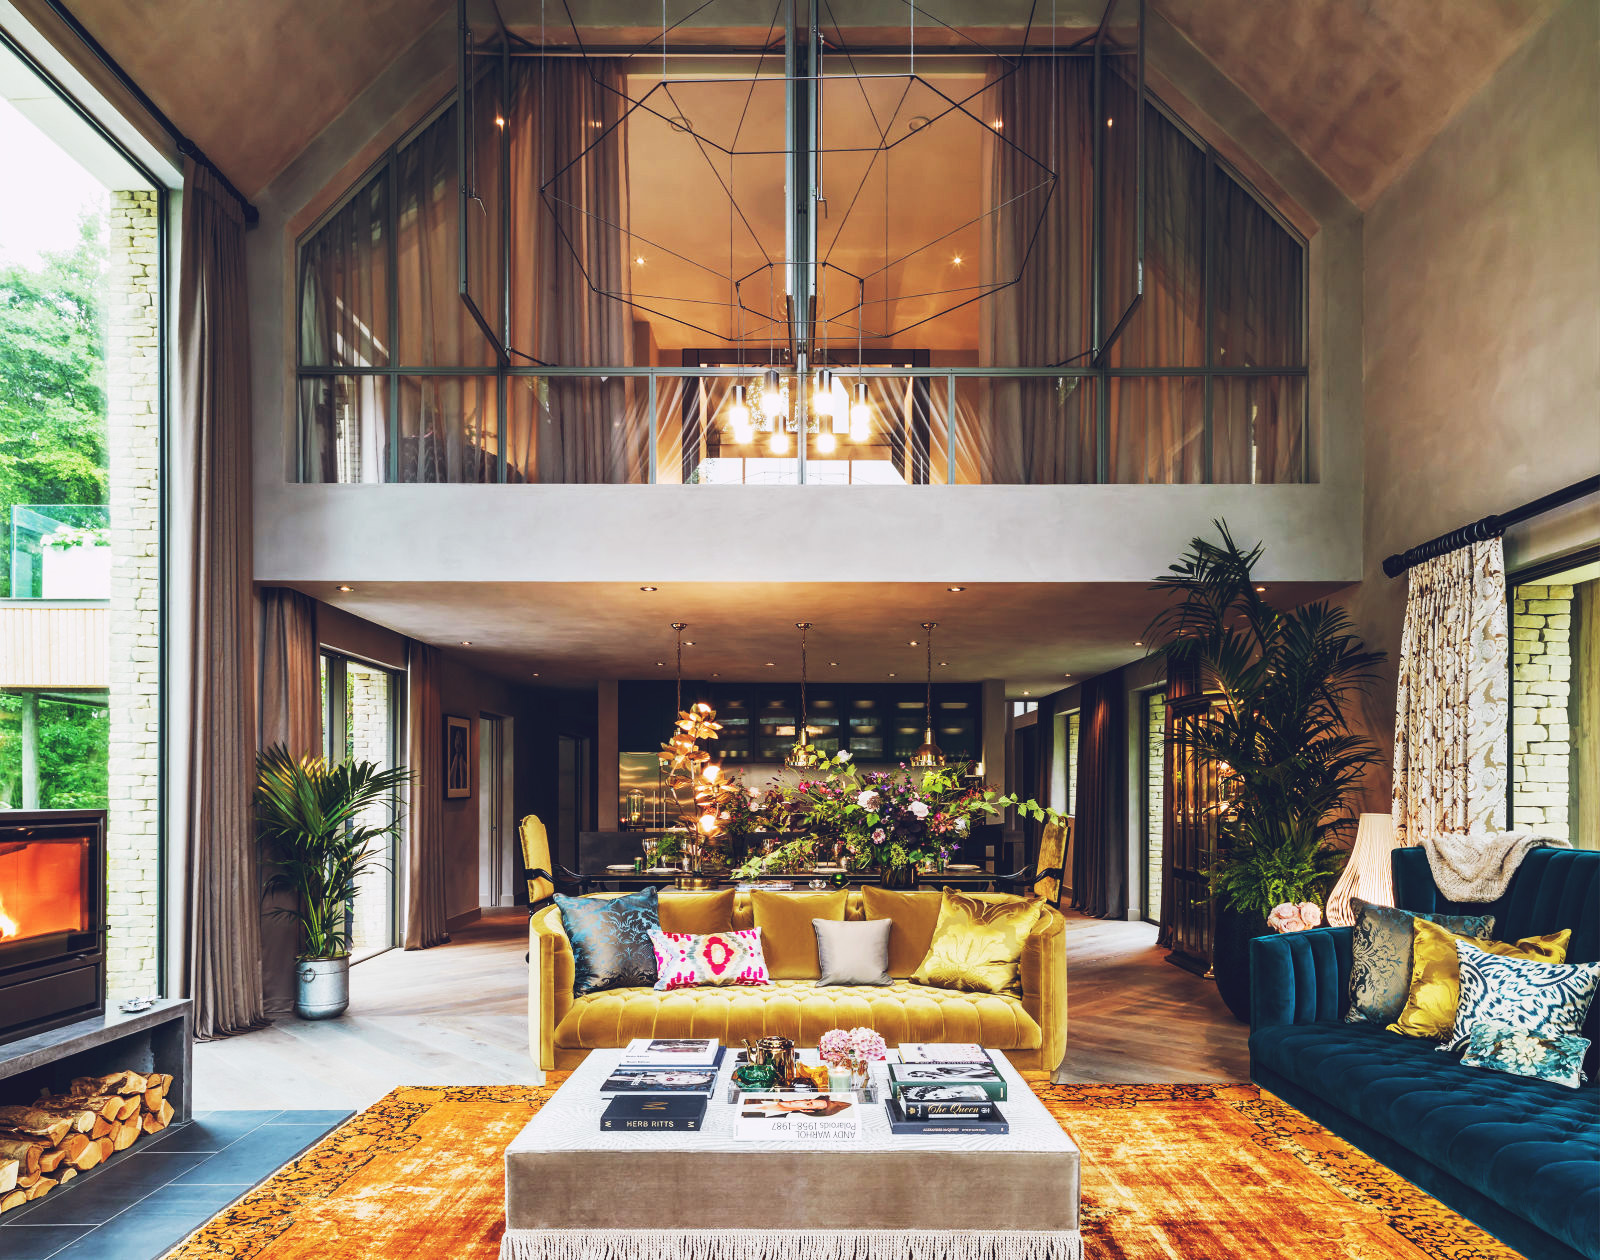 Kate moss interior designer